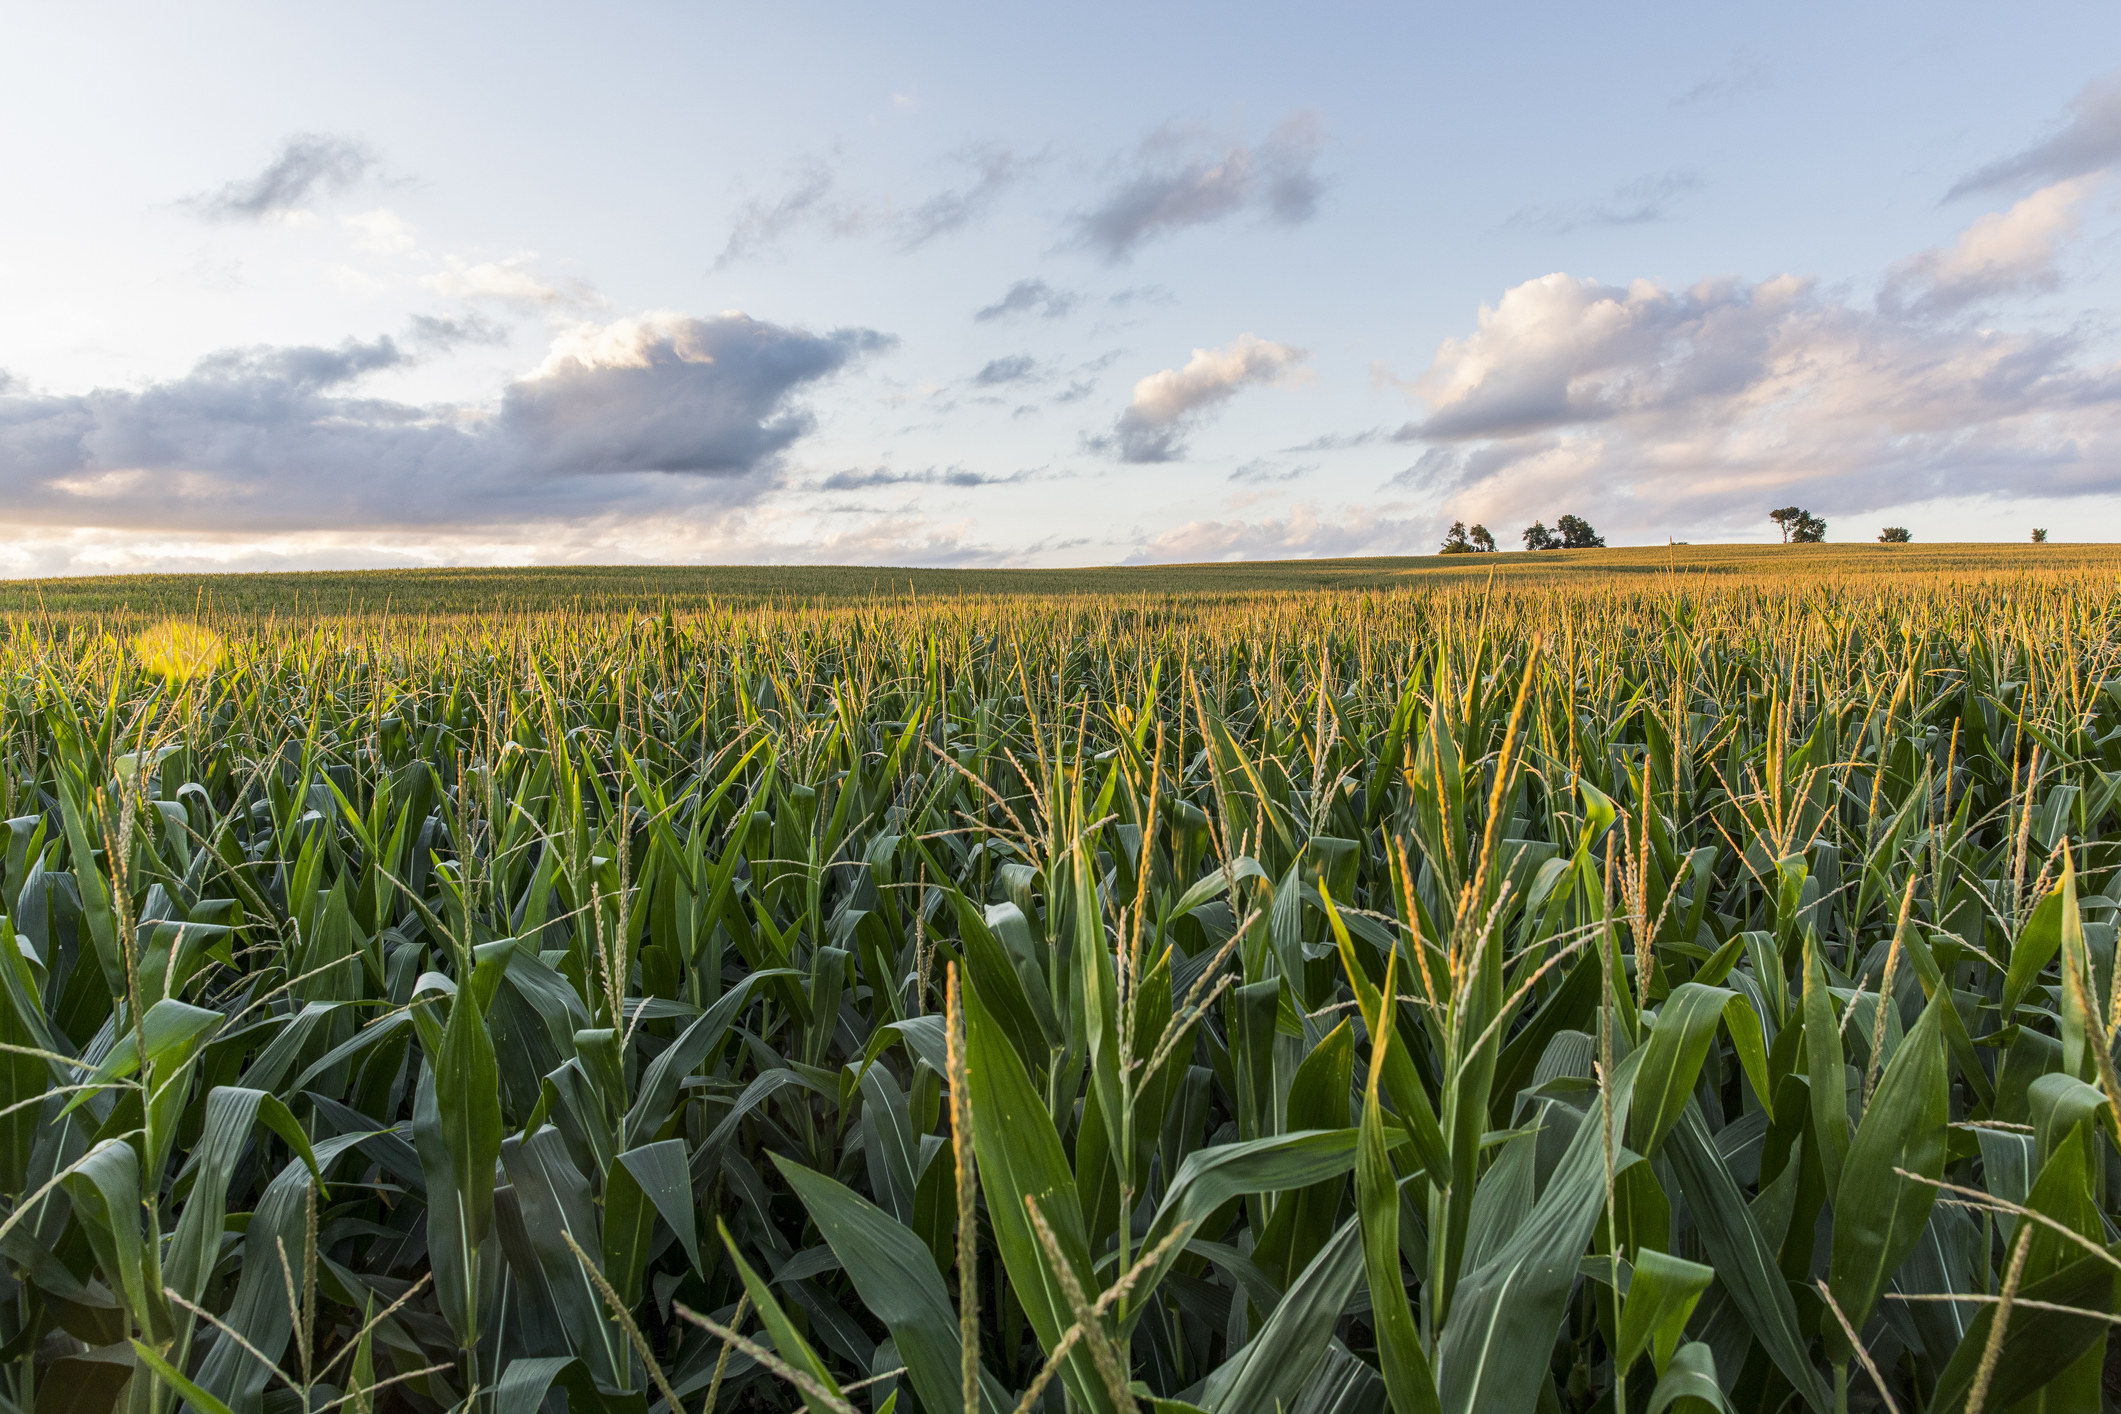 A cloudy sky over cornfields